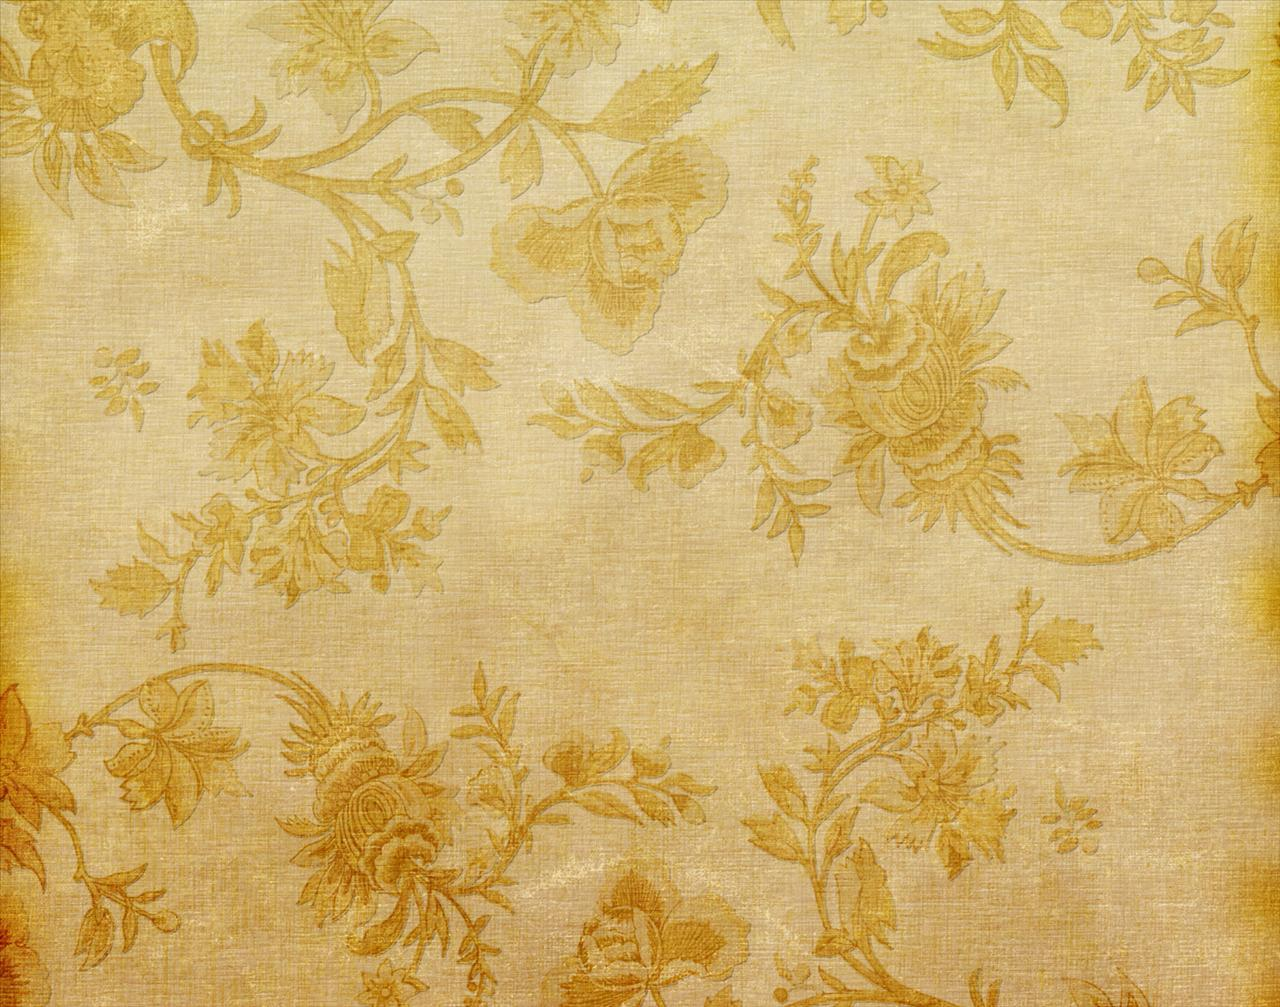 yellow wallpaper short story